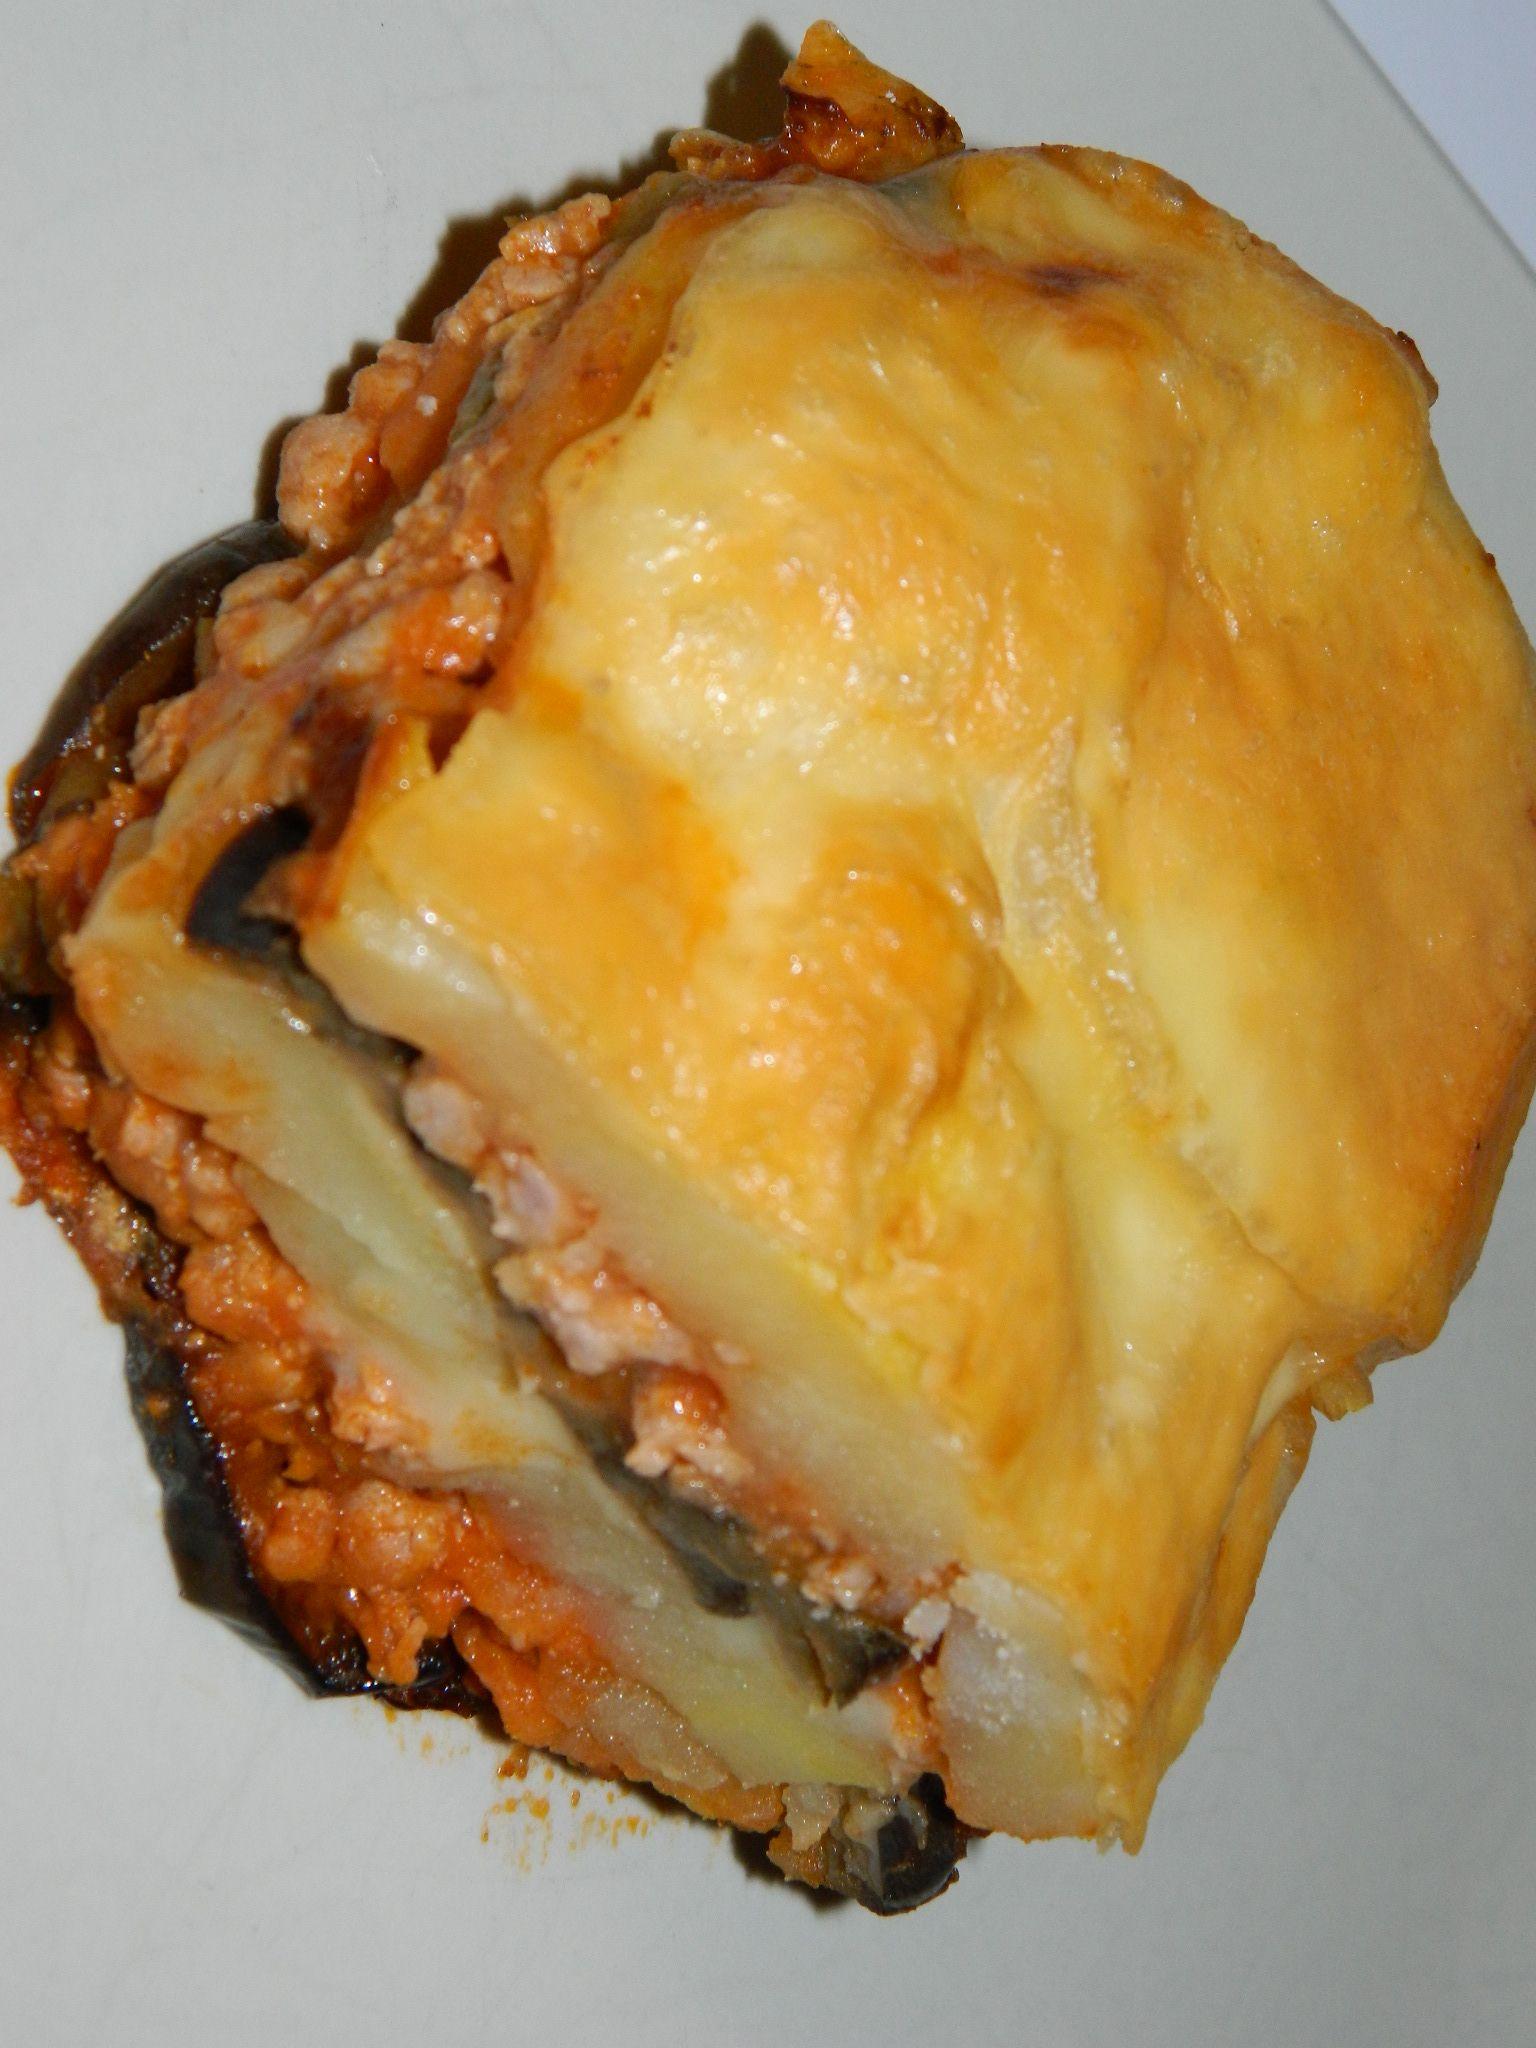 Pastel De Berenjena Patata Y Carne Recetas Abc Pastel De Berenjenas Recetas Con Patatas Lasagna De Berenjena